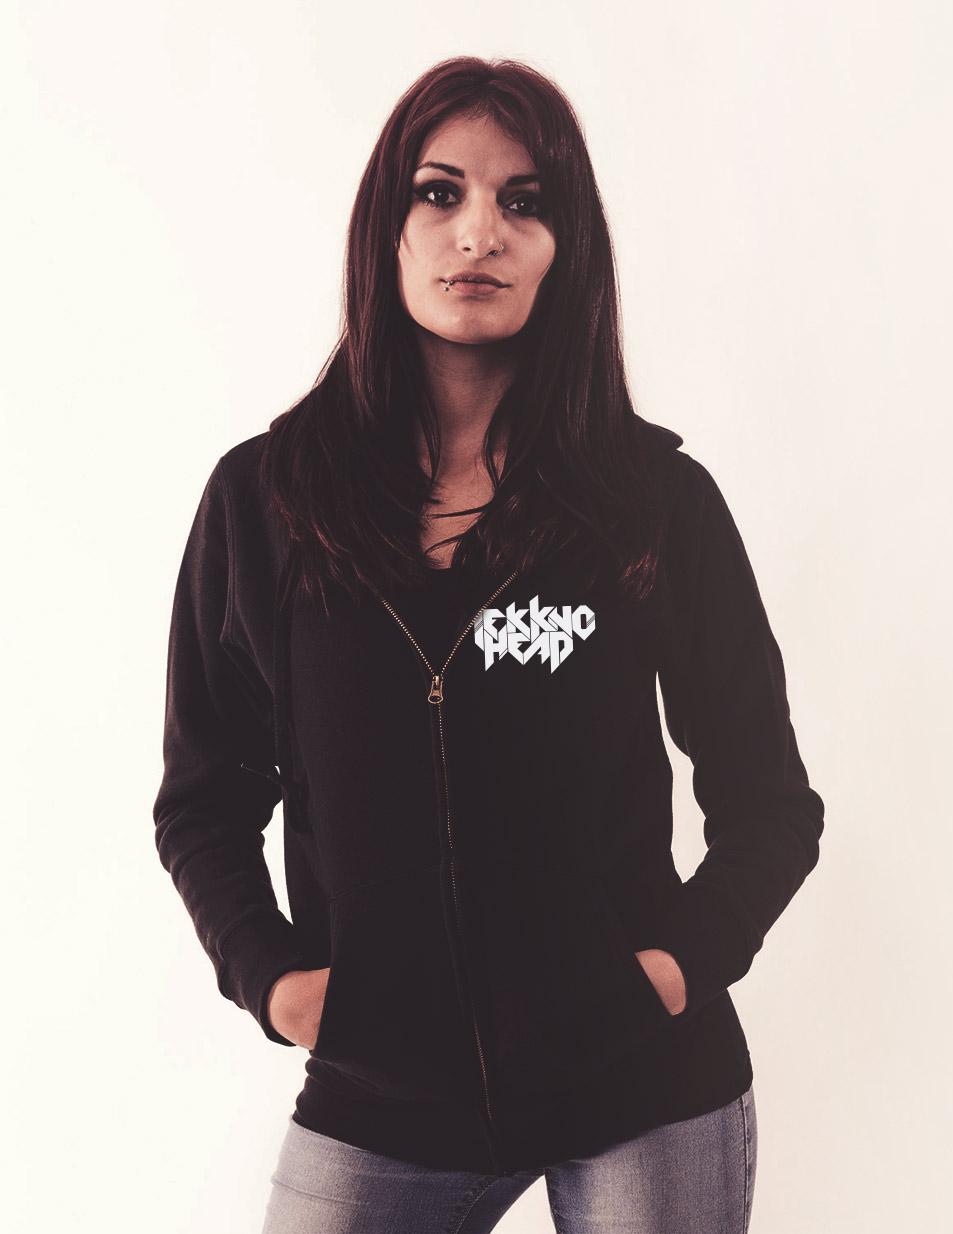 TEKKNOHEAD GirlyKappu-Zipper schwarz